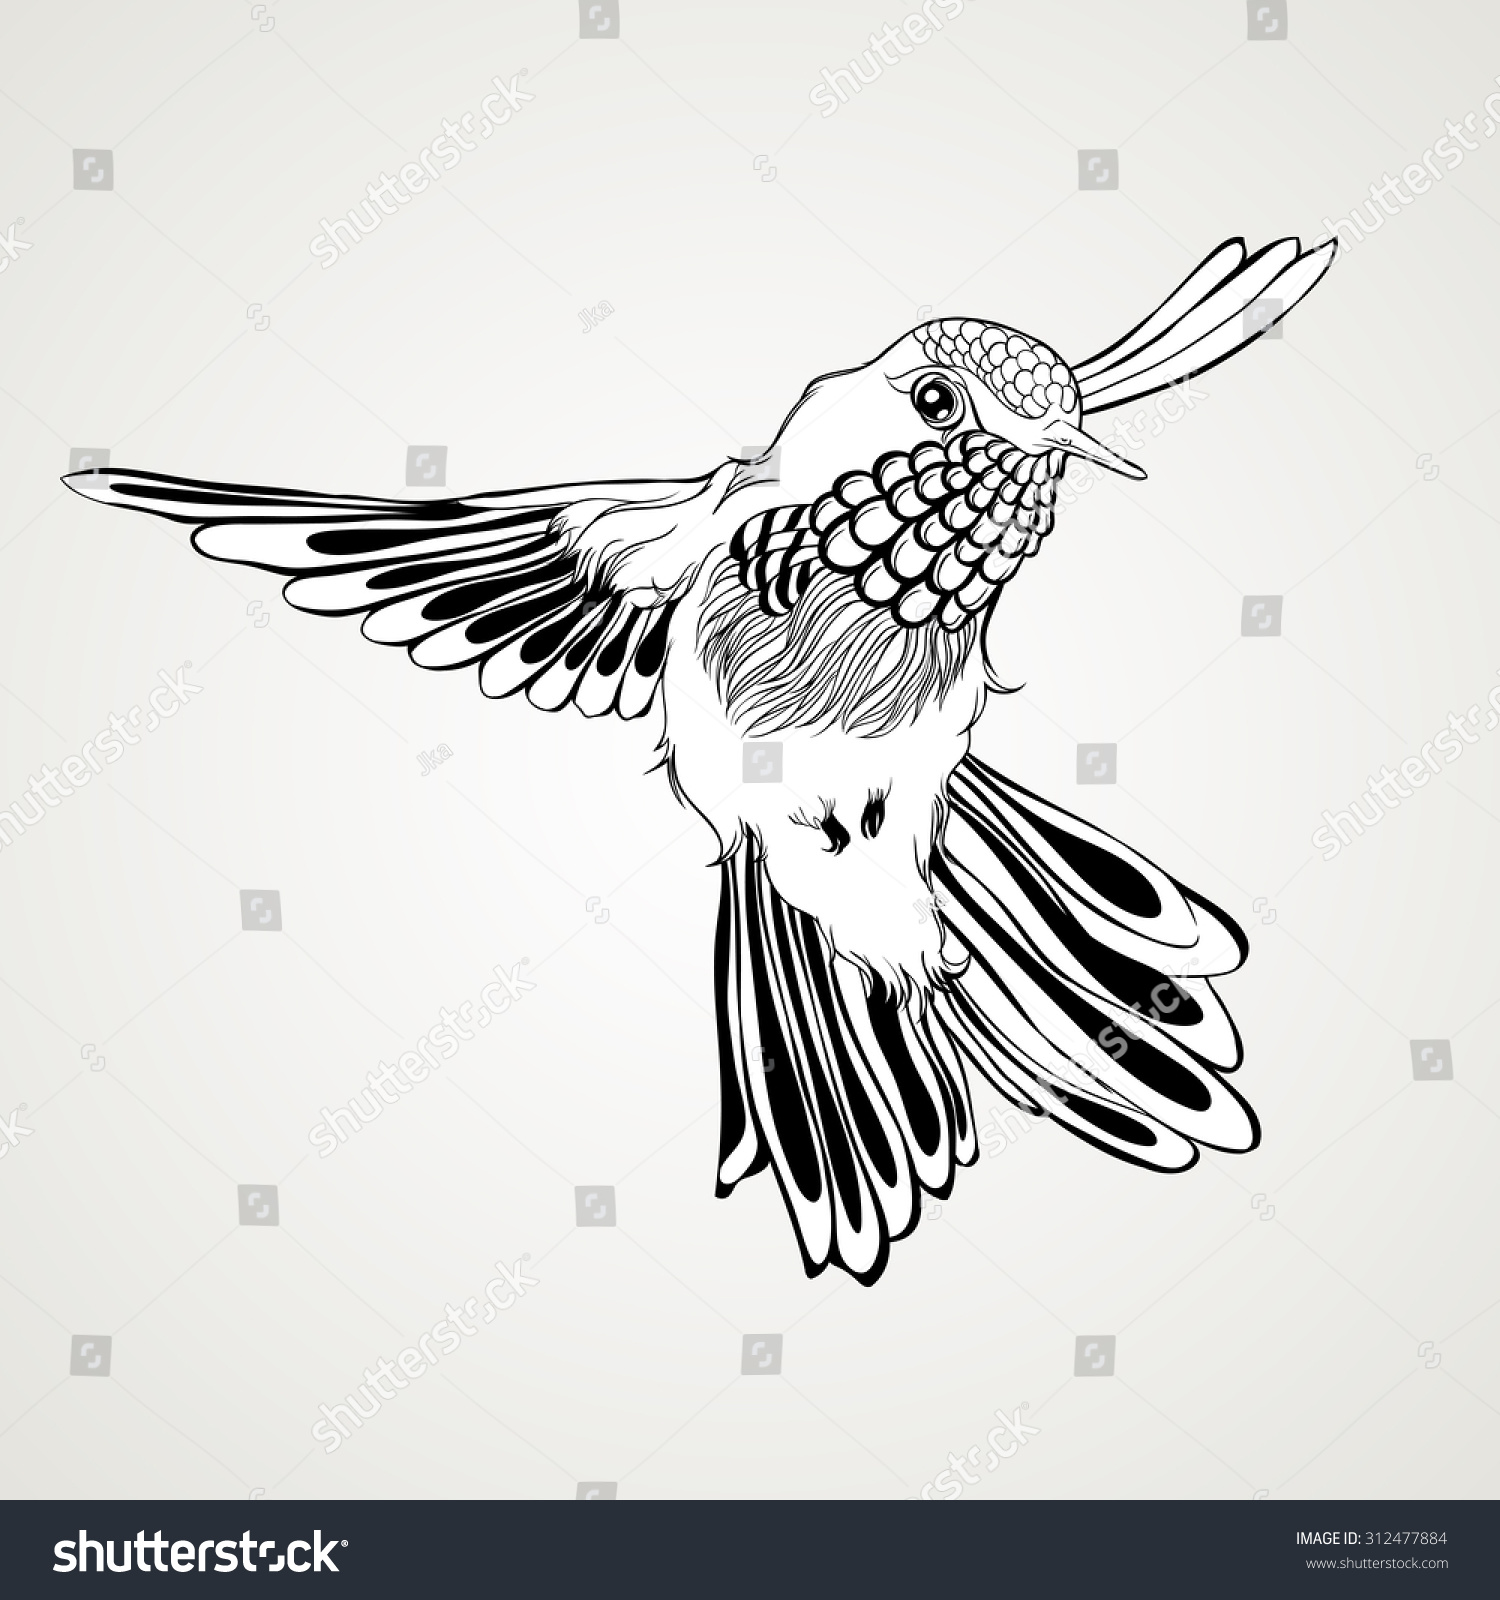 Flying bird illustration vintage - photo#21